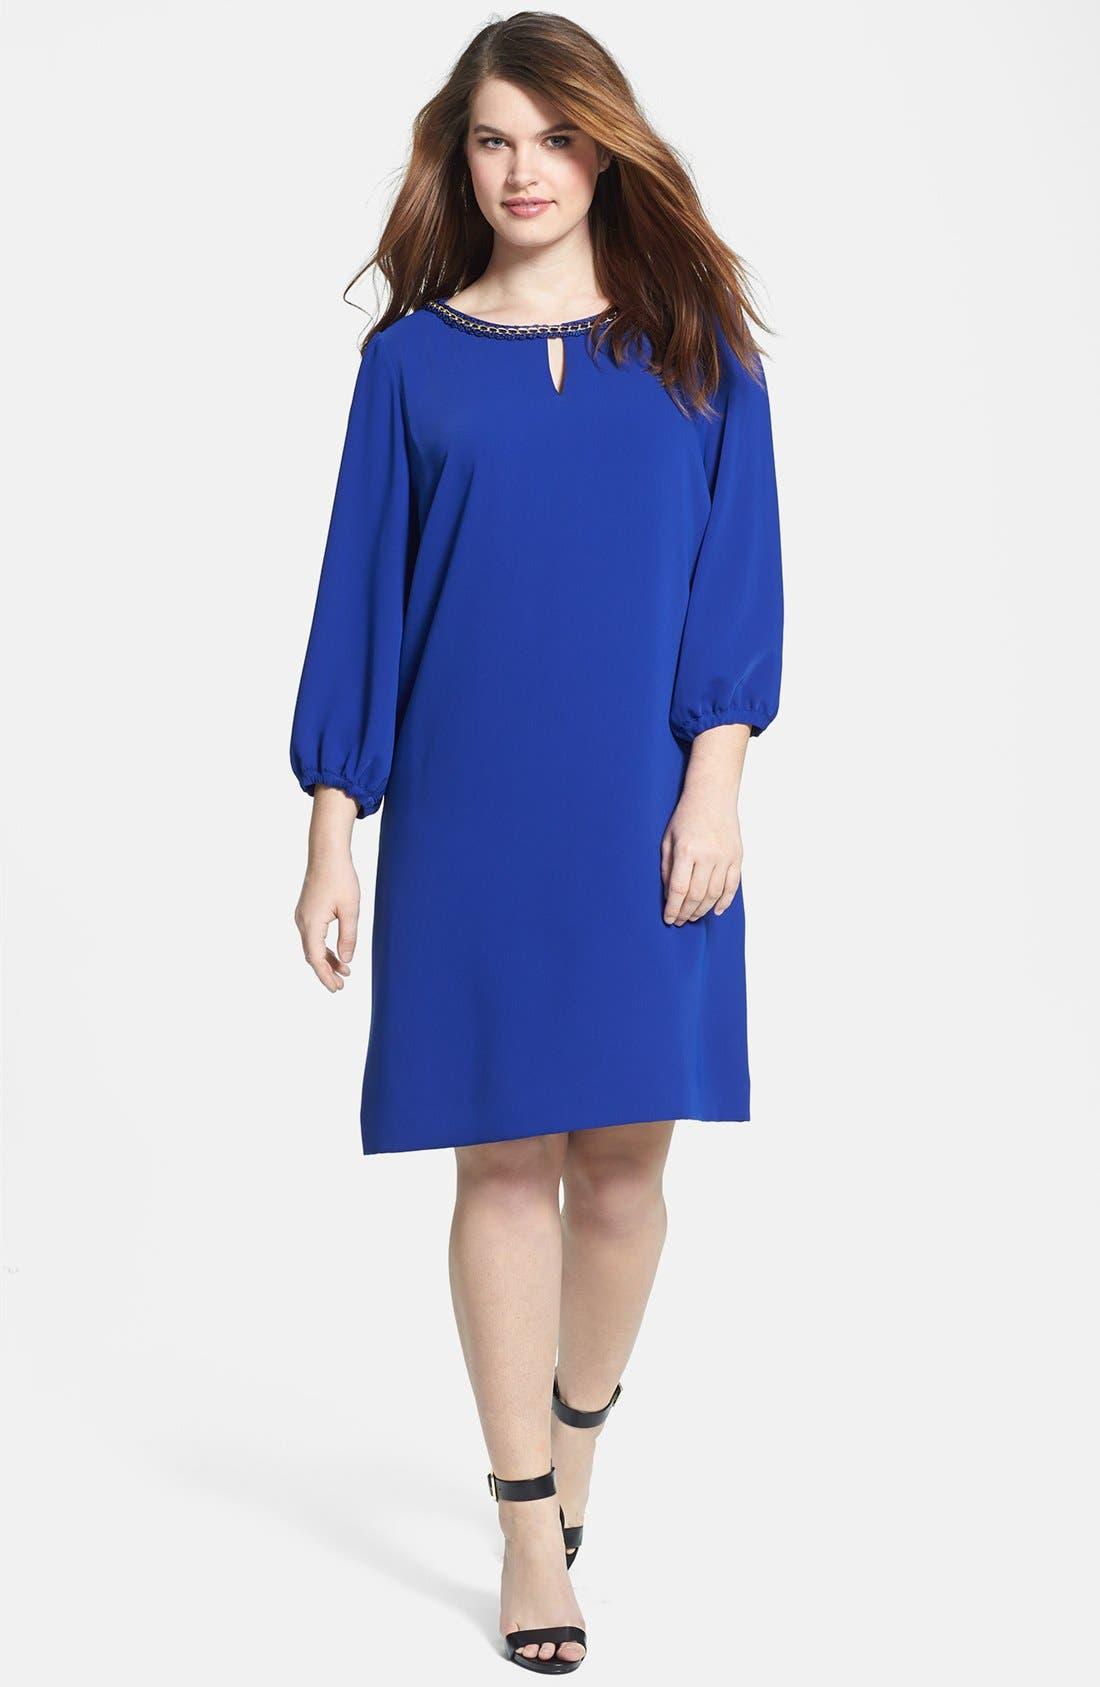 Alternate Image 1 Selected - Tahari Chain Detail Shift Dress (Plus Size)